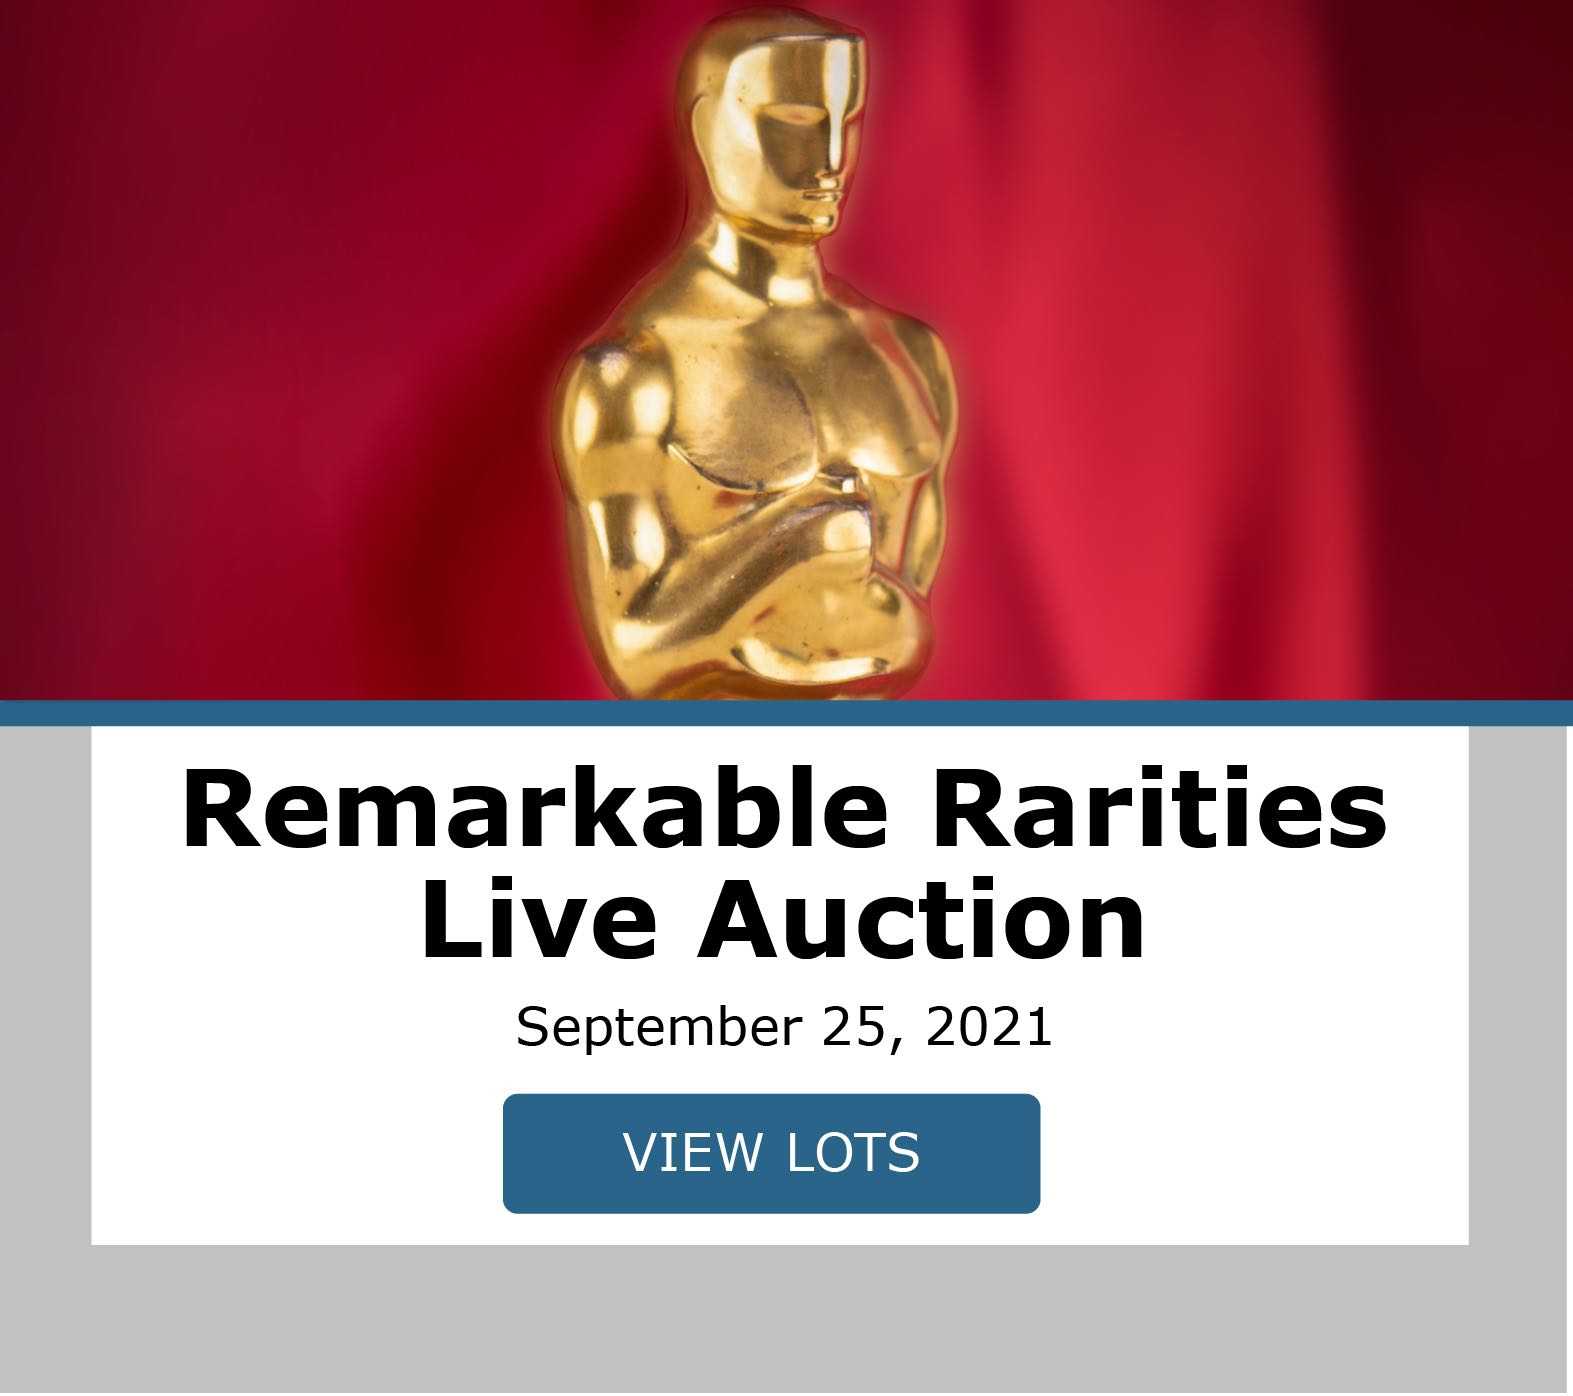 617 : Remarkable Rarities